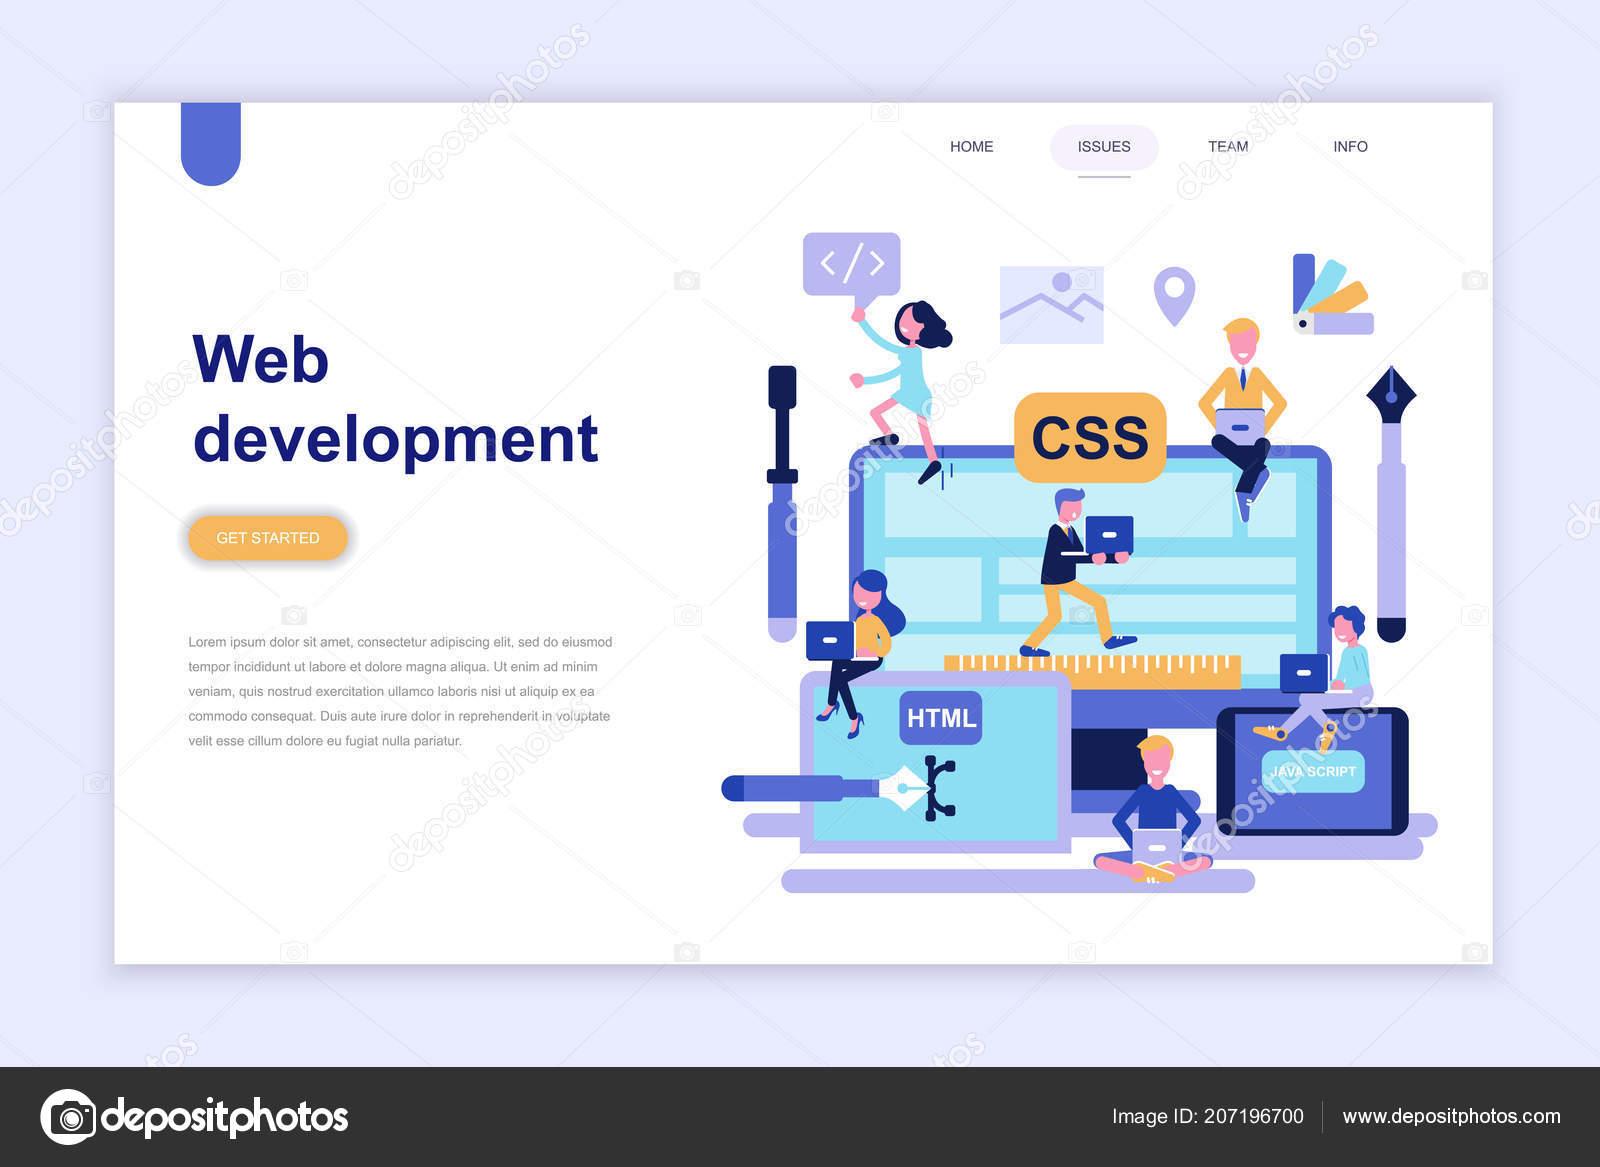 Landing Page Template Web Development Modern Flat Design Concept Learning Stock Vector C Alexdndz 207196700